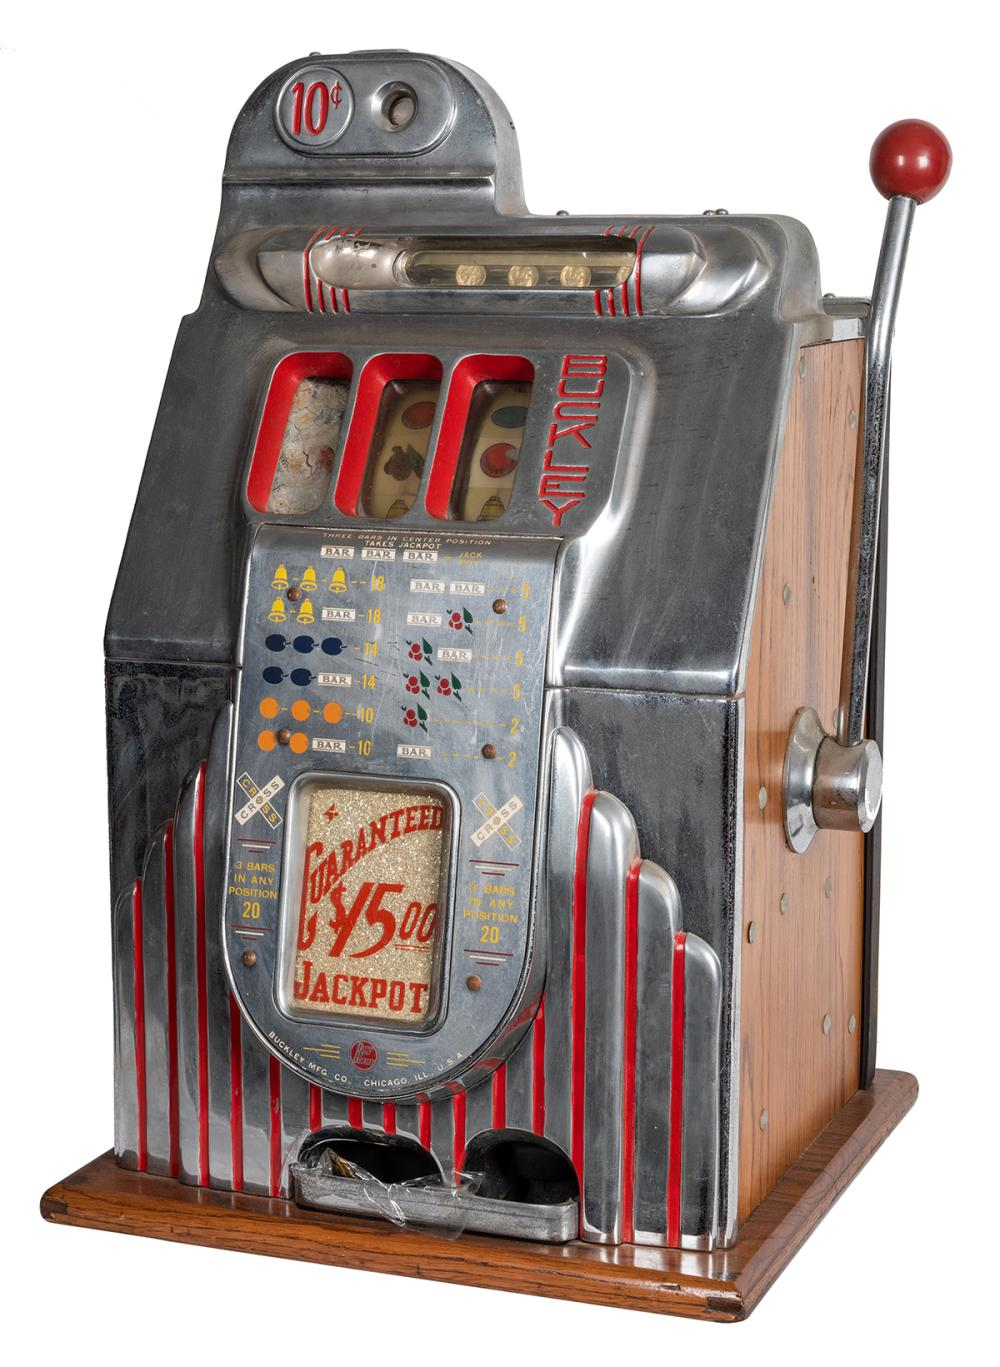 Jackpotter slot machine ranma 1 2 free online games